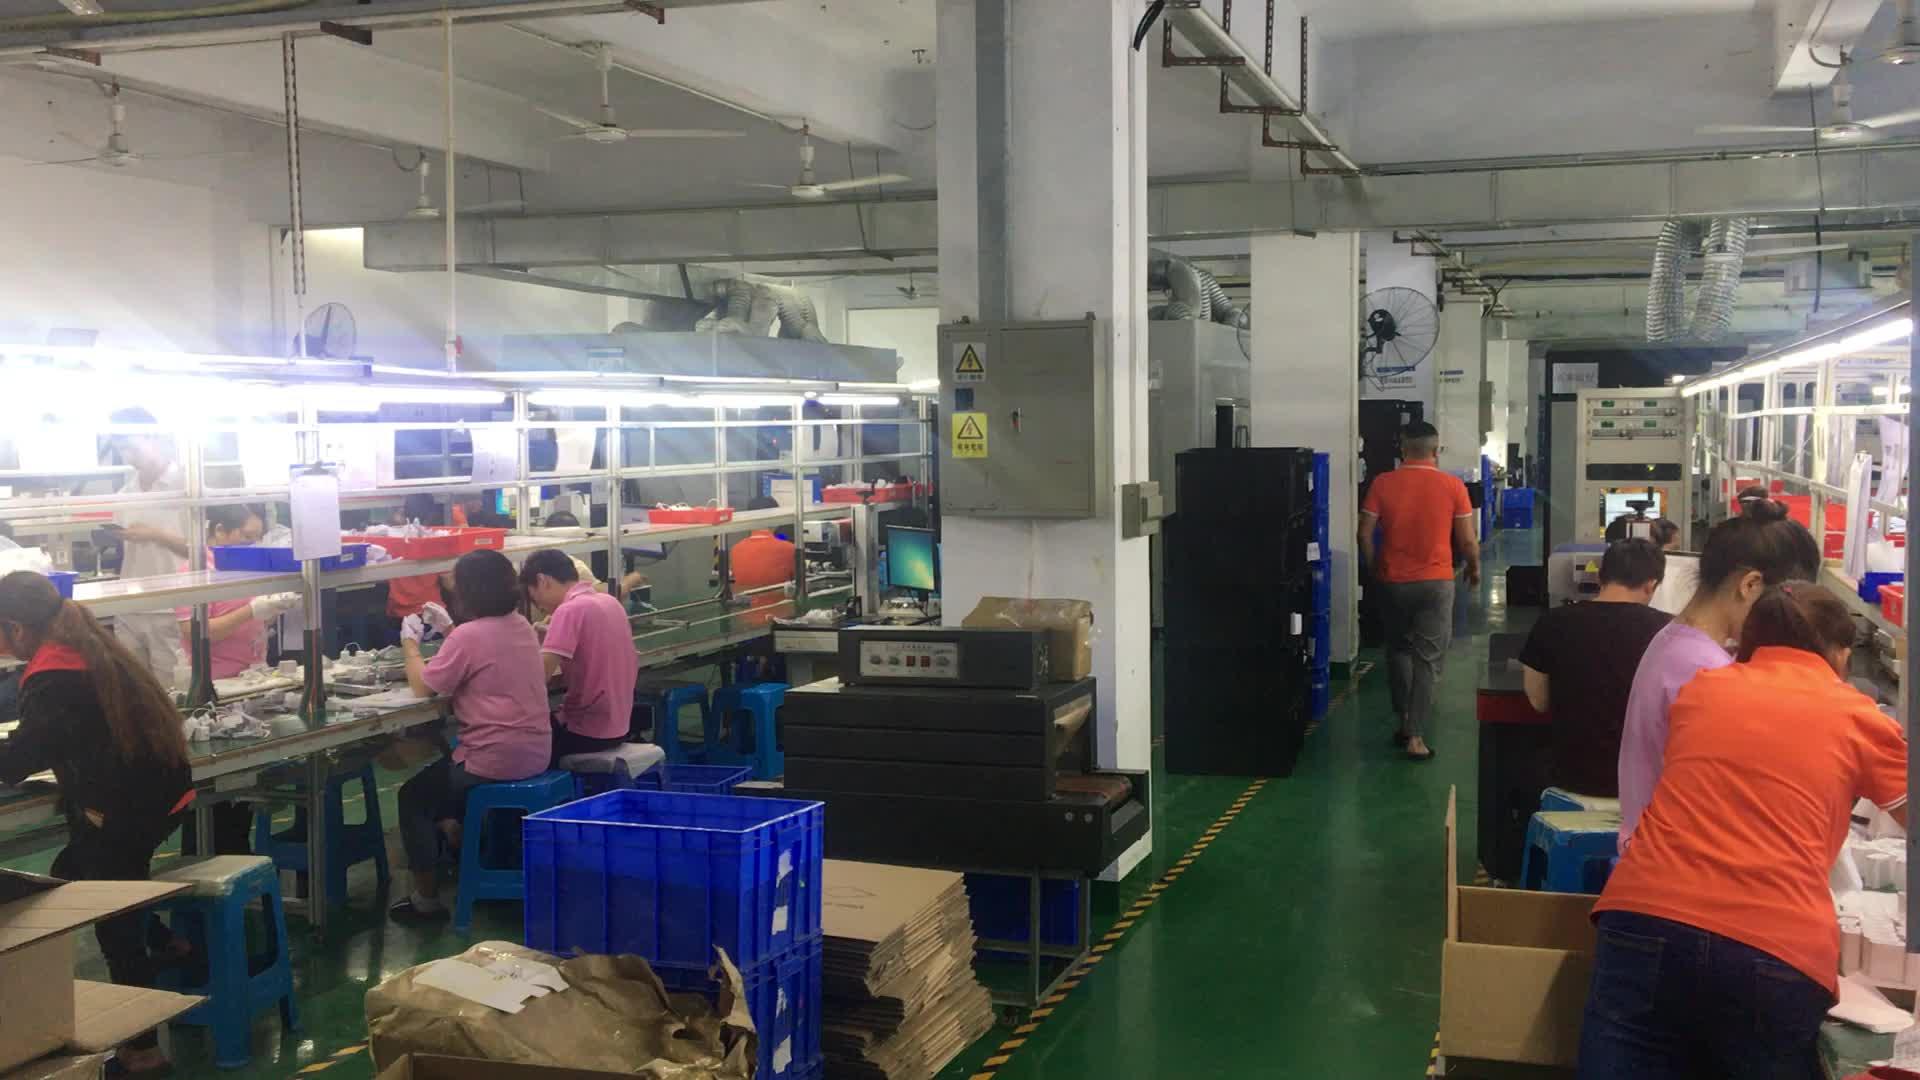 Shenzhen lieferant 48 w power adopter wand plug Power Adapter 12 v 15 v 24 v 48 v 1a 2a 2.5a 3a AC zu DC power